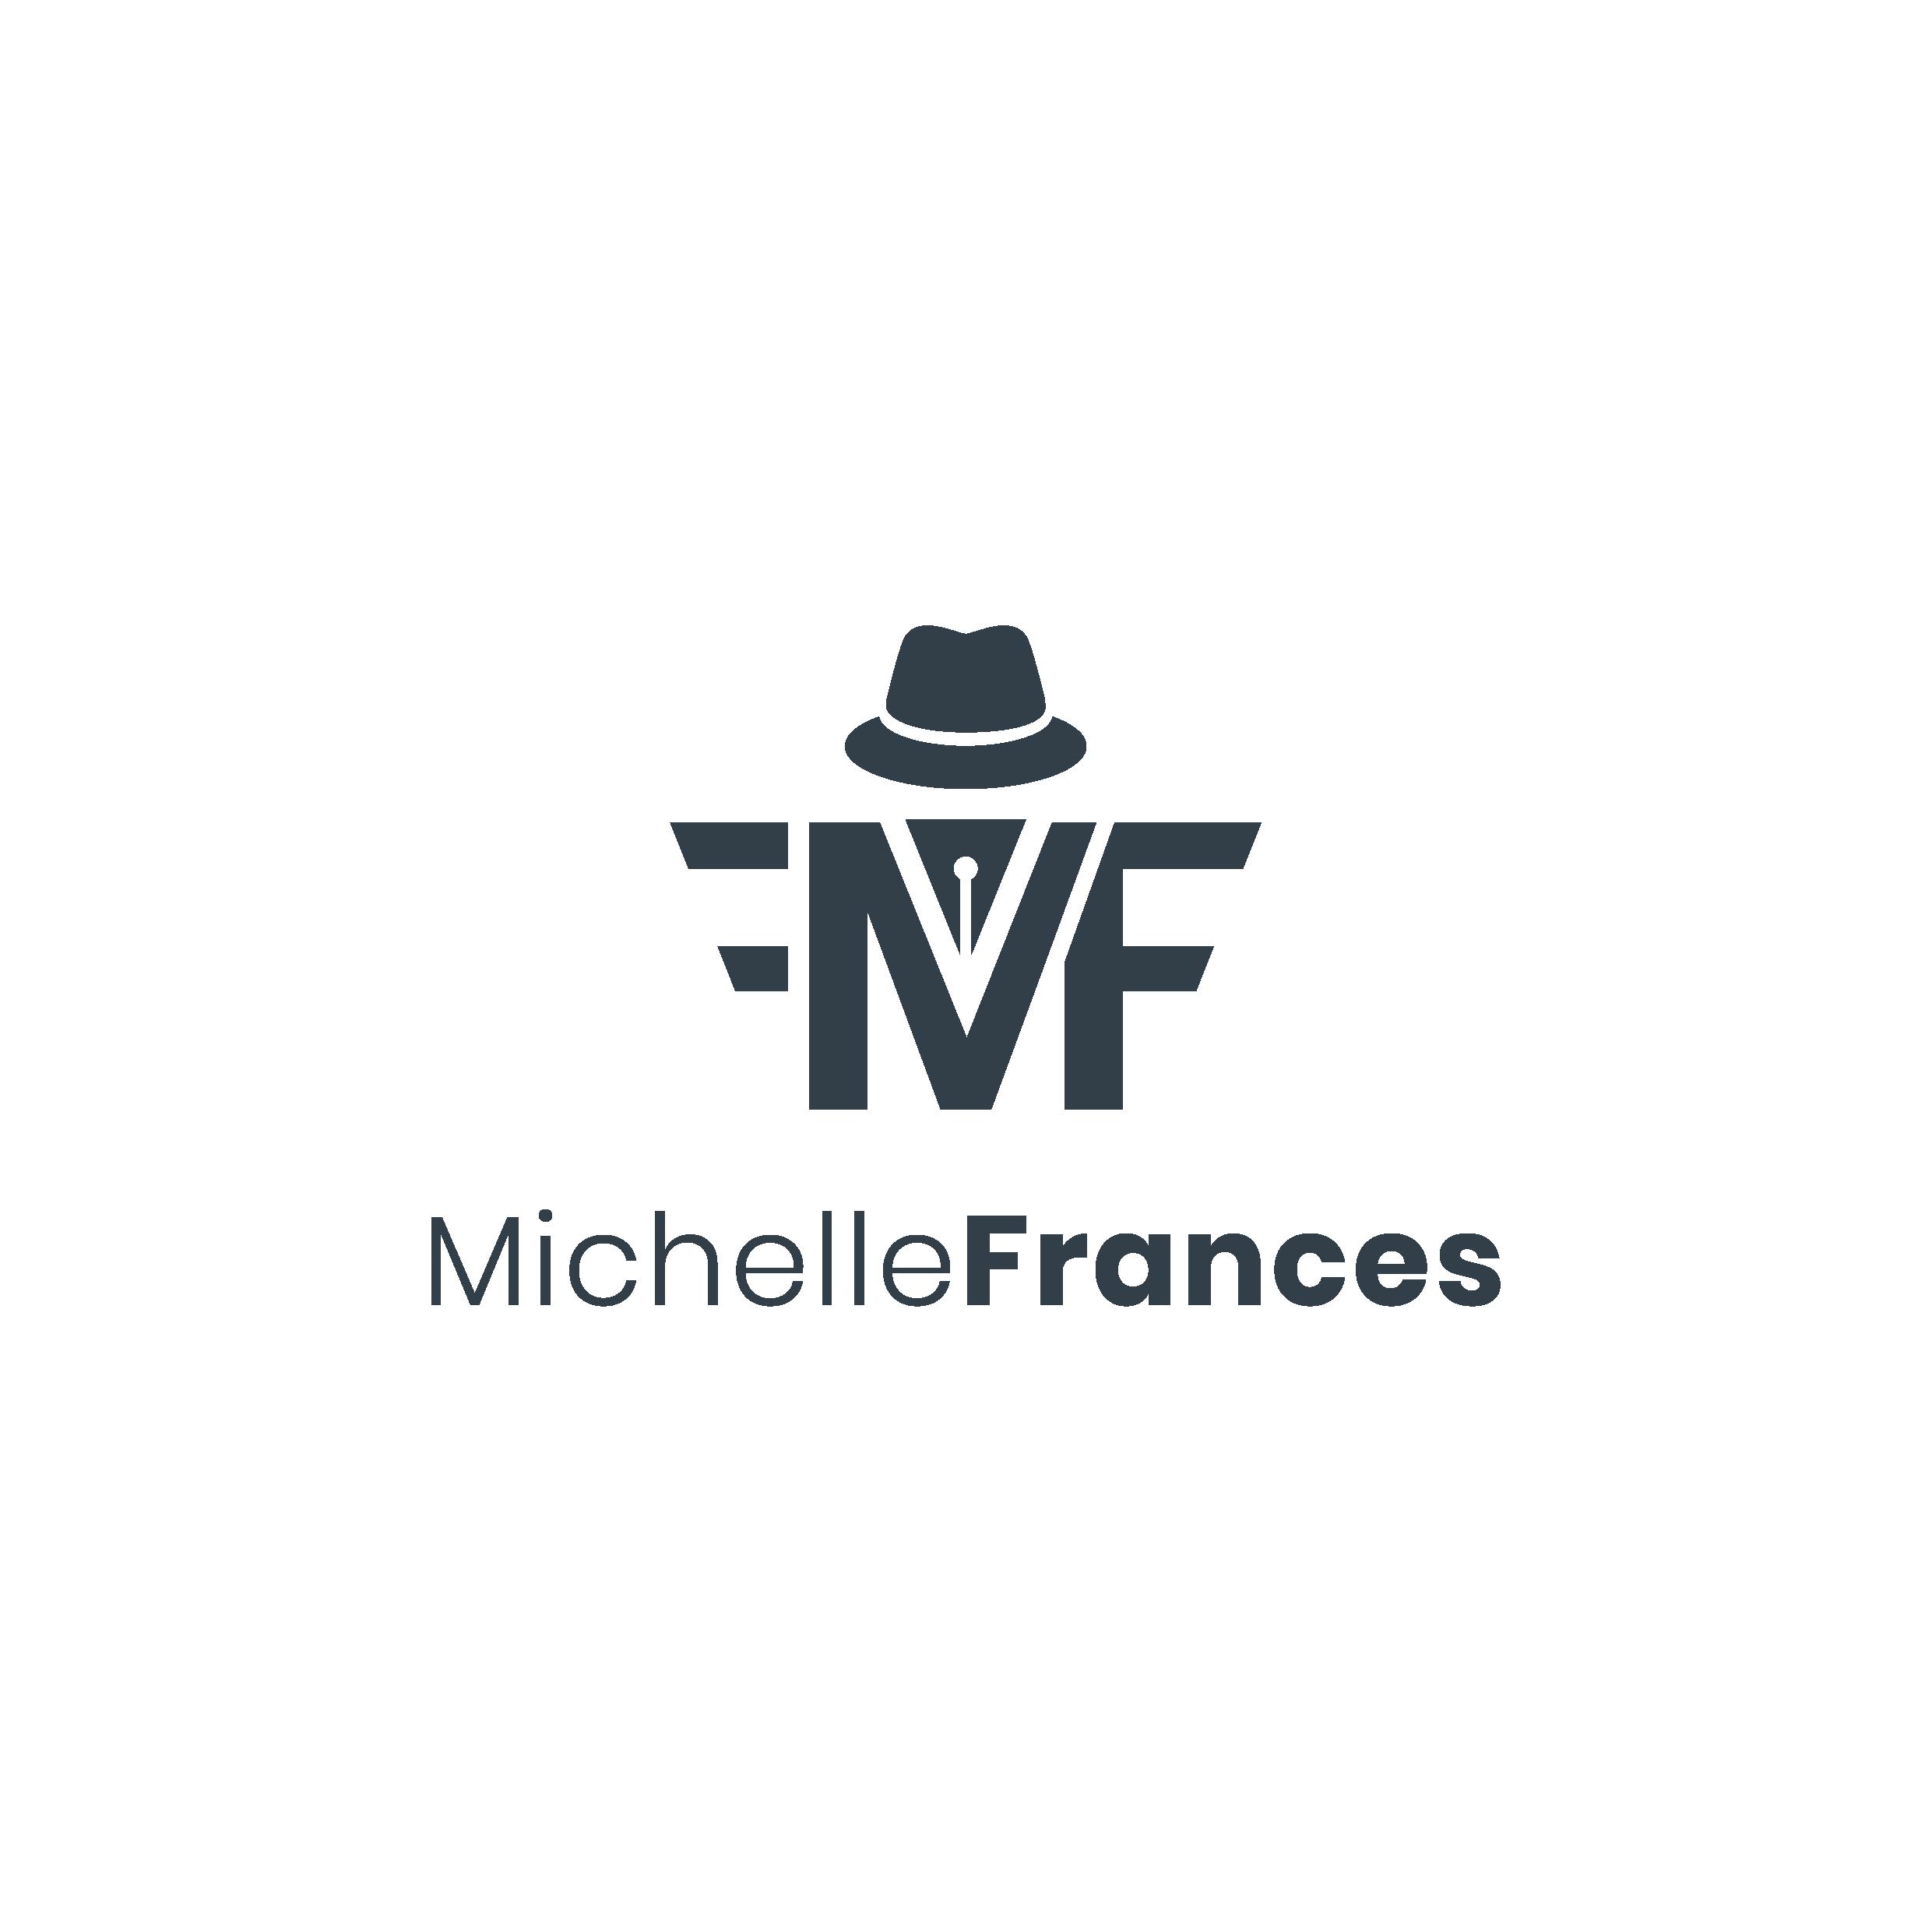 logo mystery